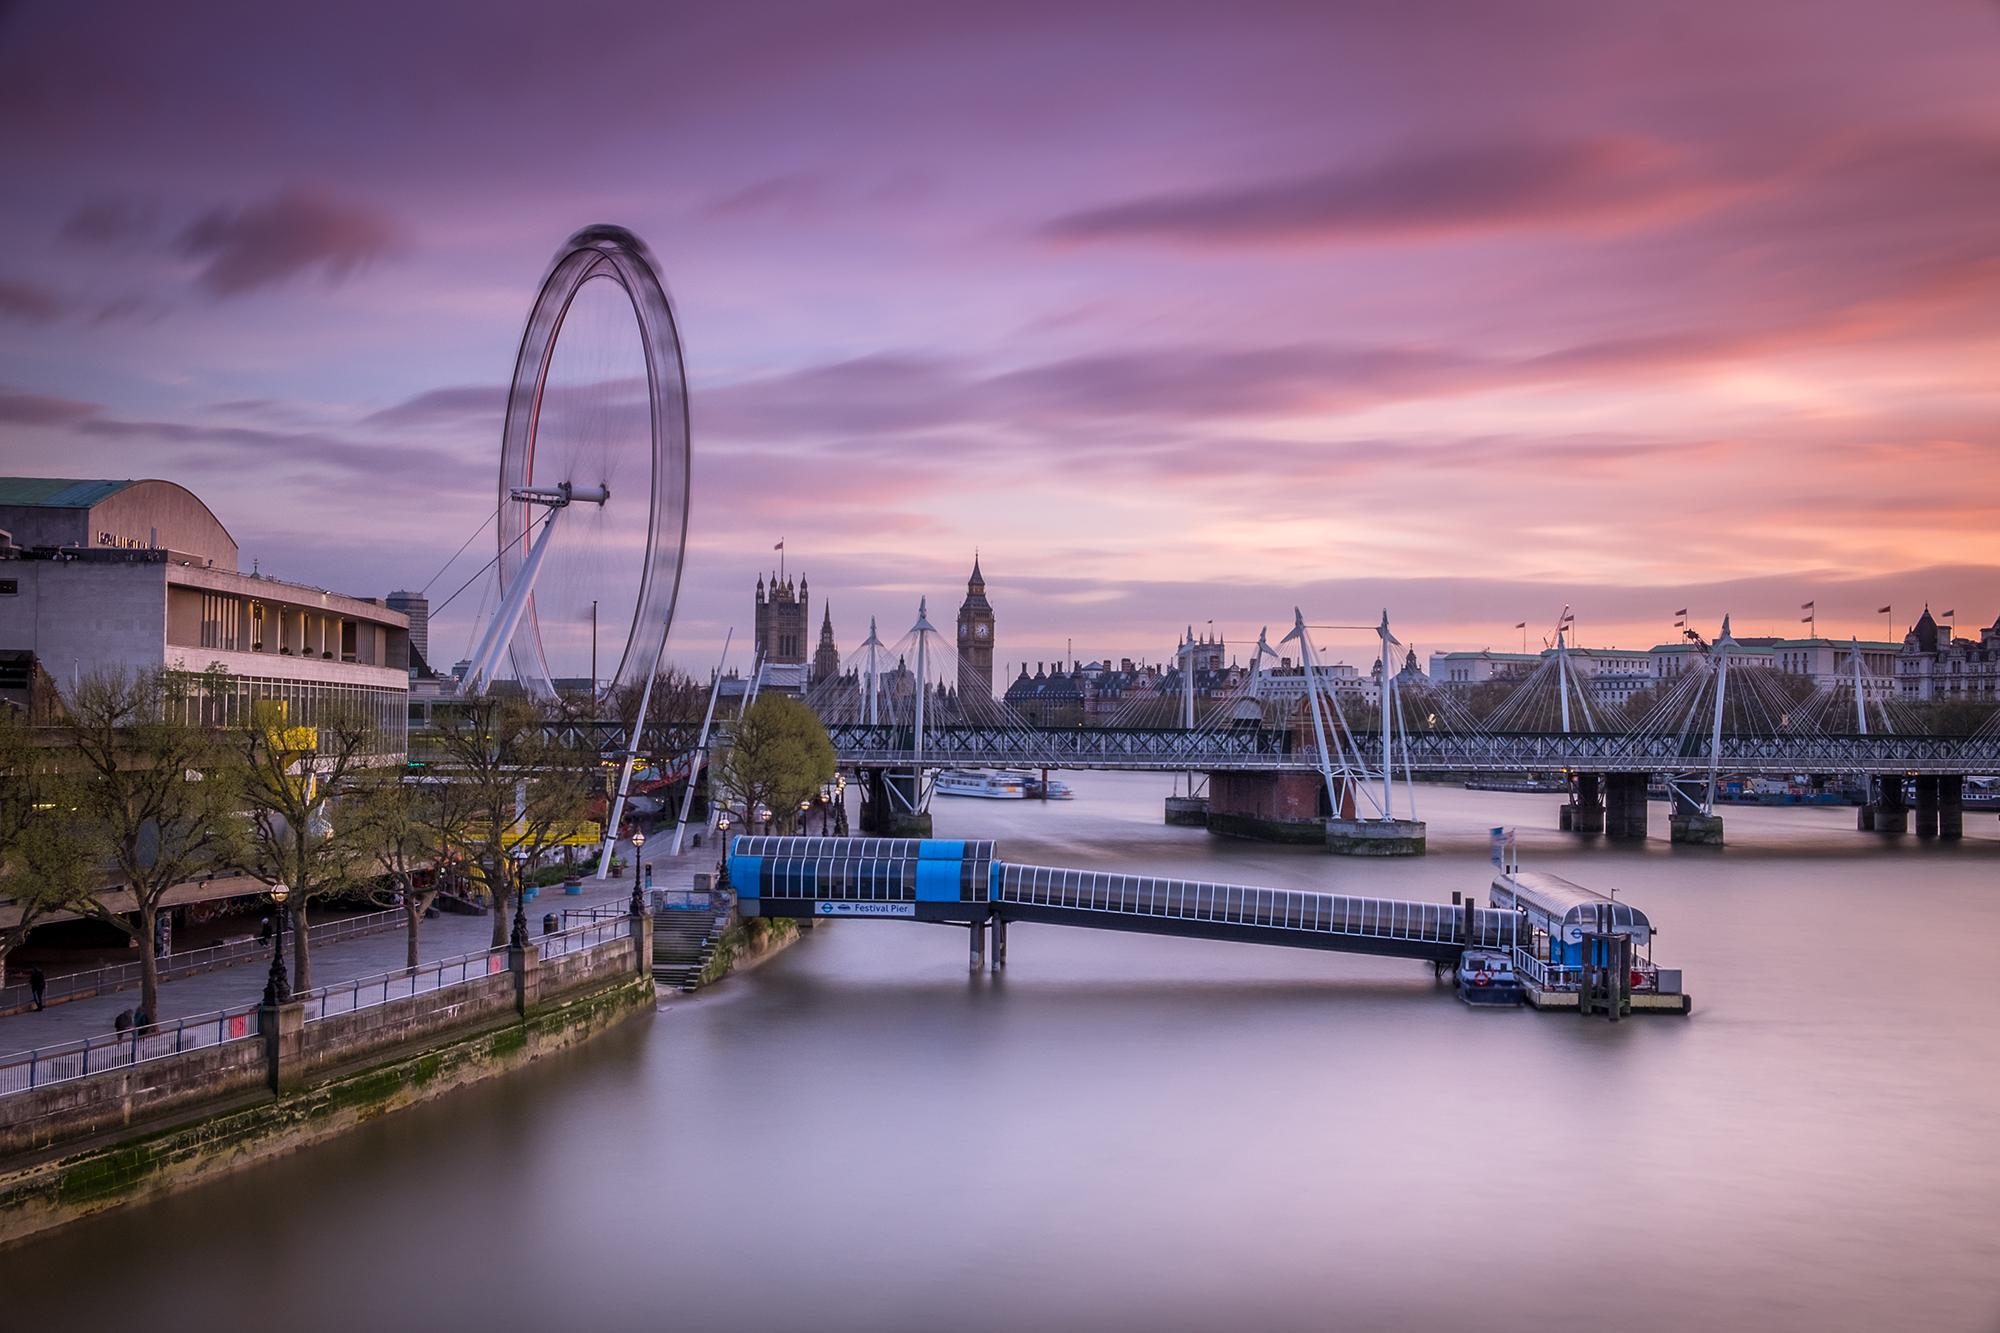 Long exposure sunset photo of the London eye taken by Trevor Sherwin